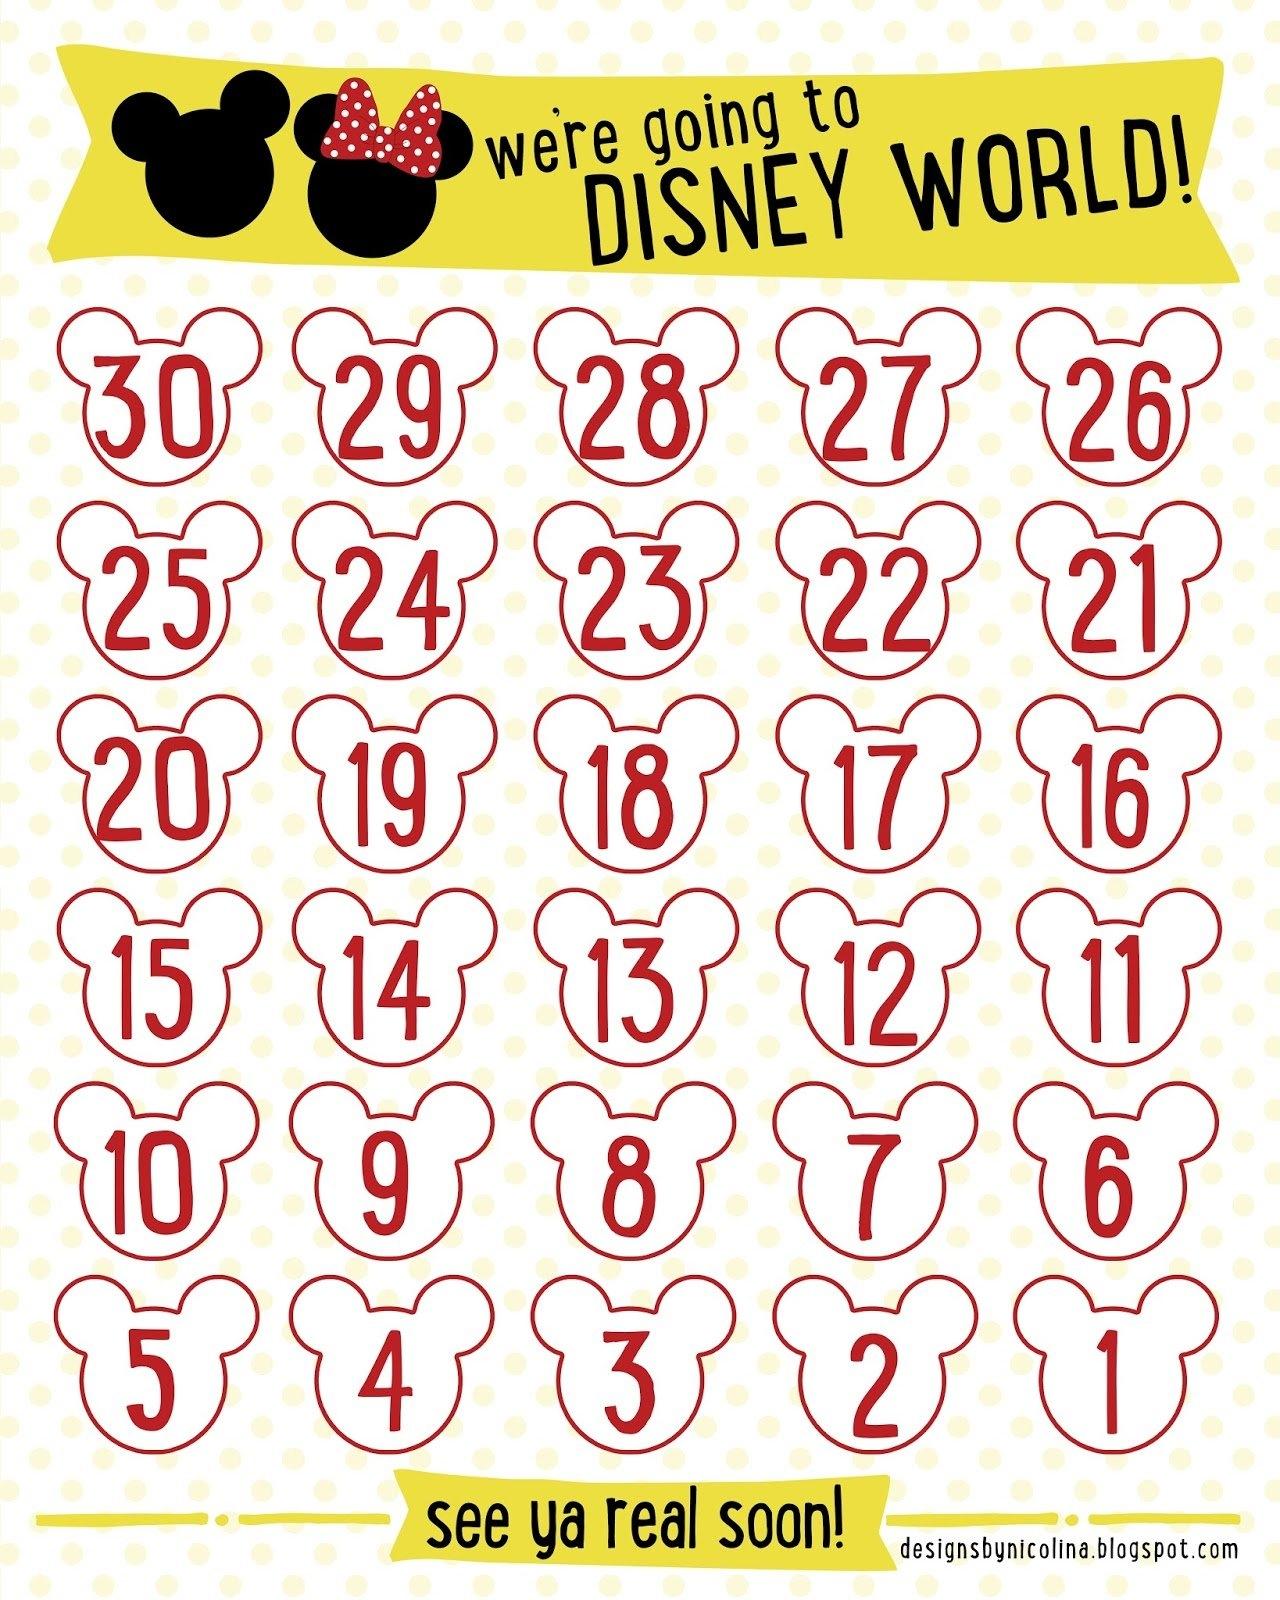 Designsnicolina: Disney Countdown! /// Free Printable with regard to 6 Week Countdown Calendar Photo